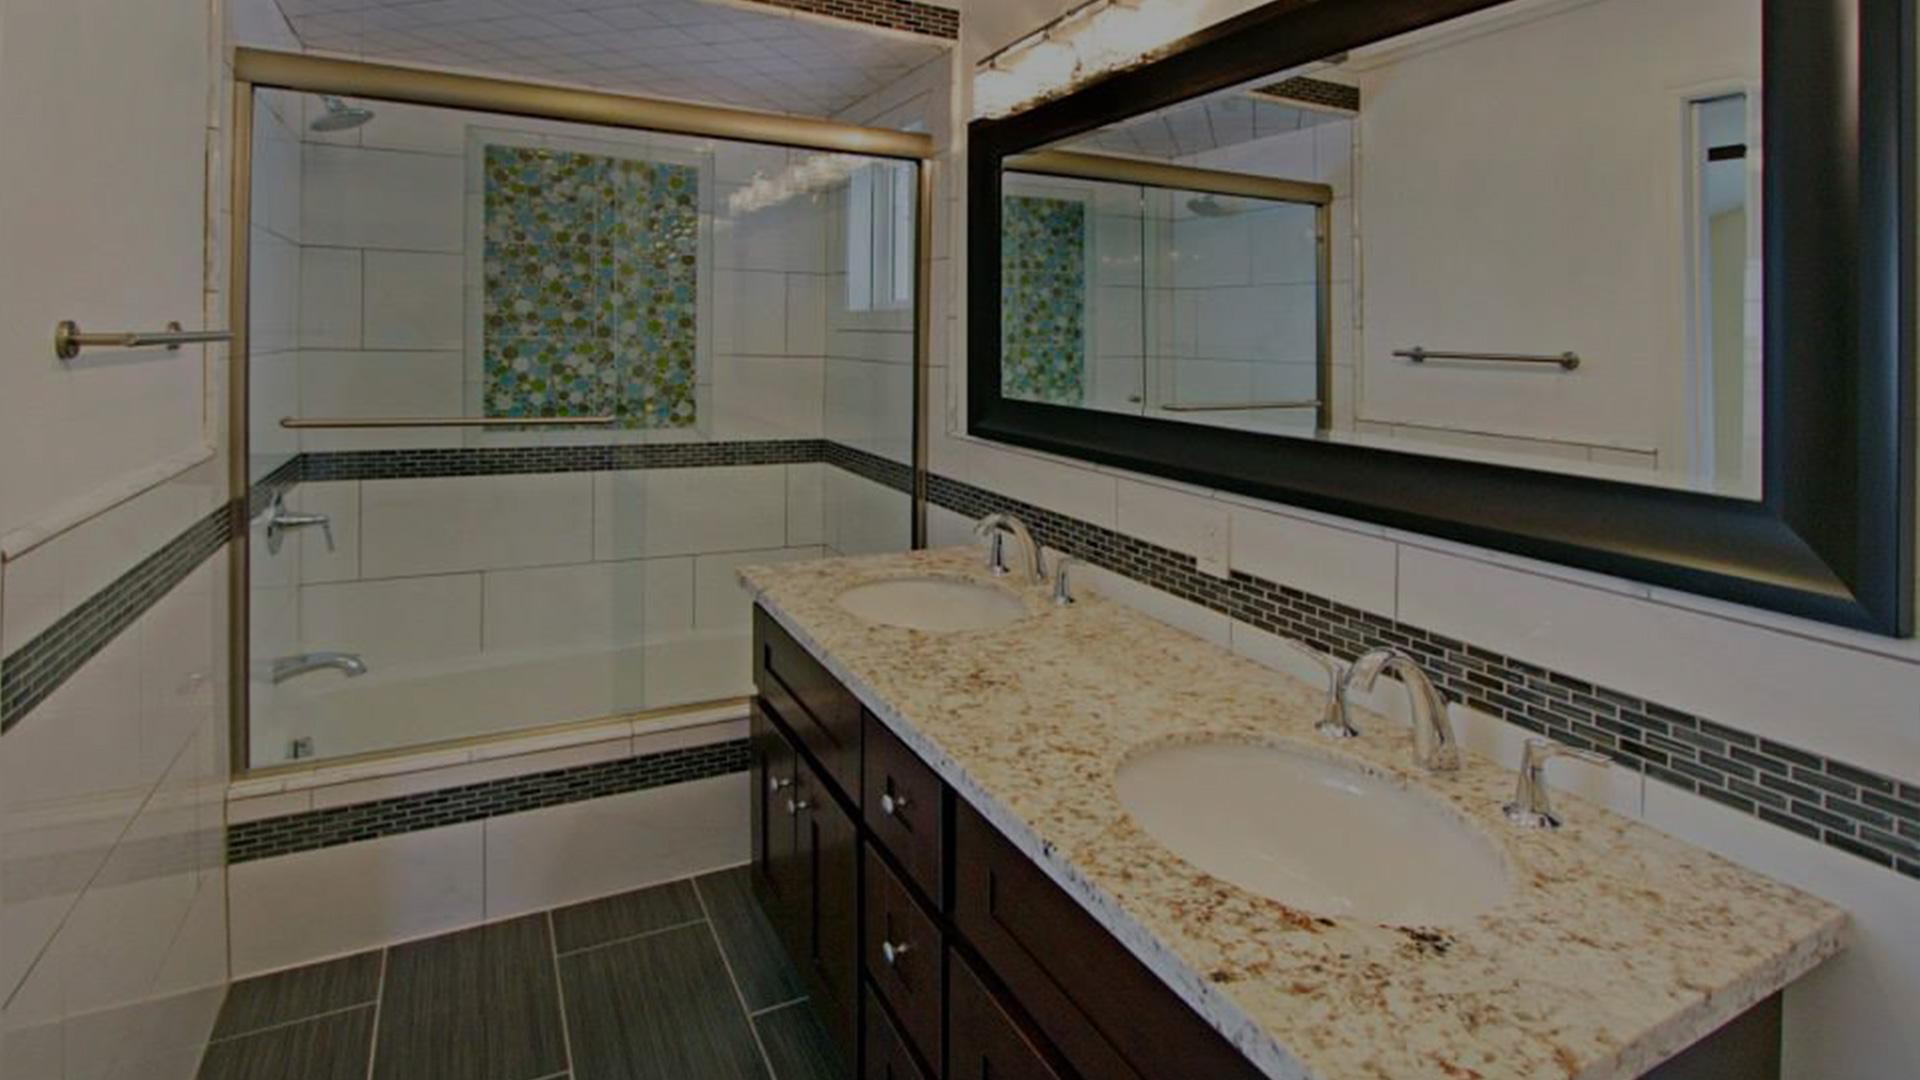 Whittier Tile and Terrazzo Installation